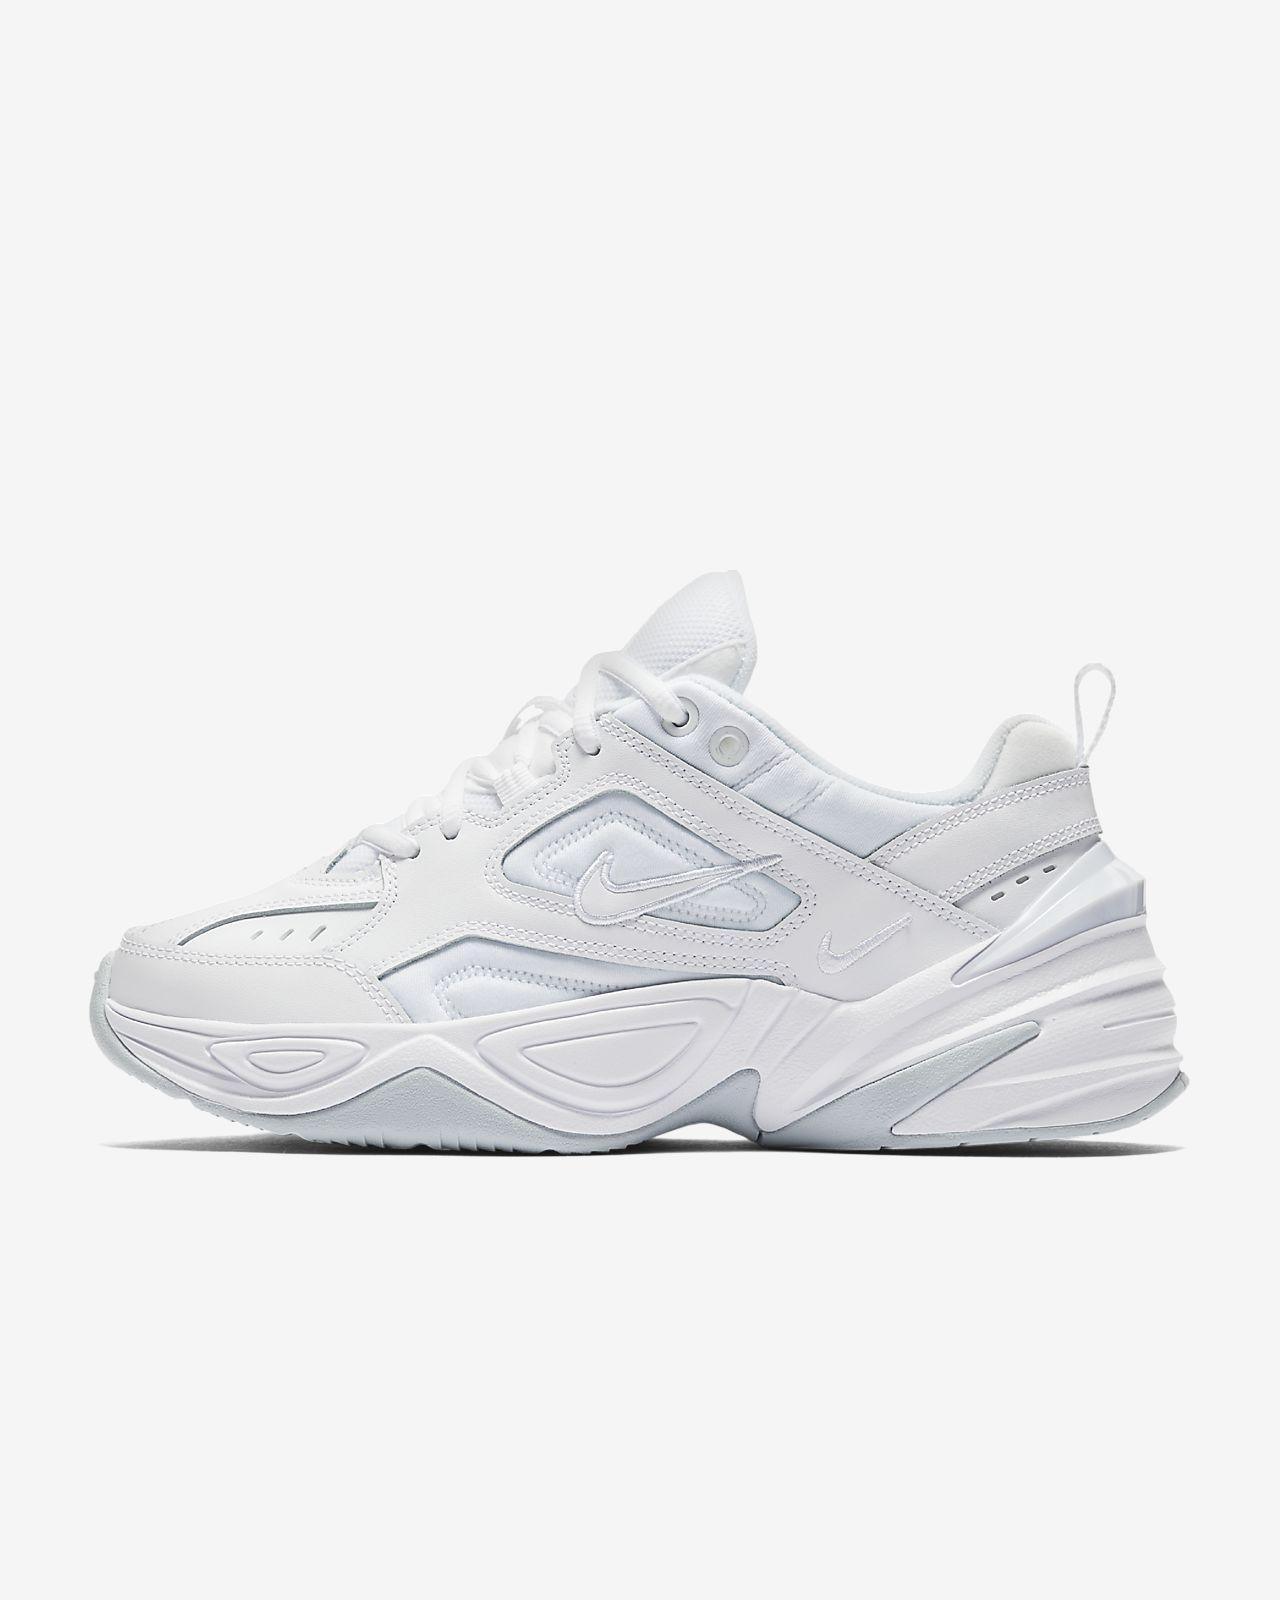 Nike M2K Tekno Women's Shoe | Dad shoes, Comfortable mens